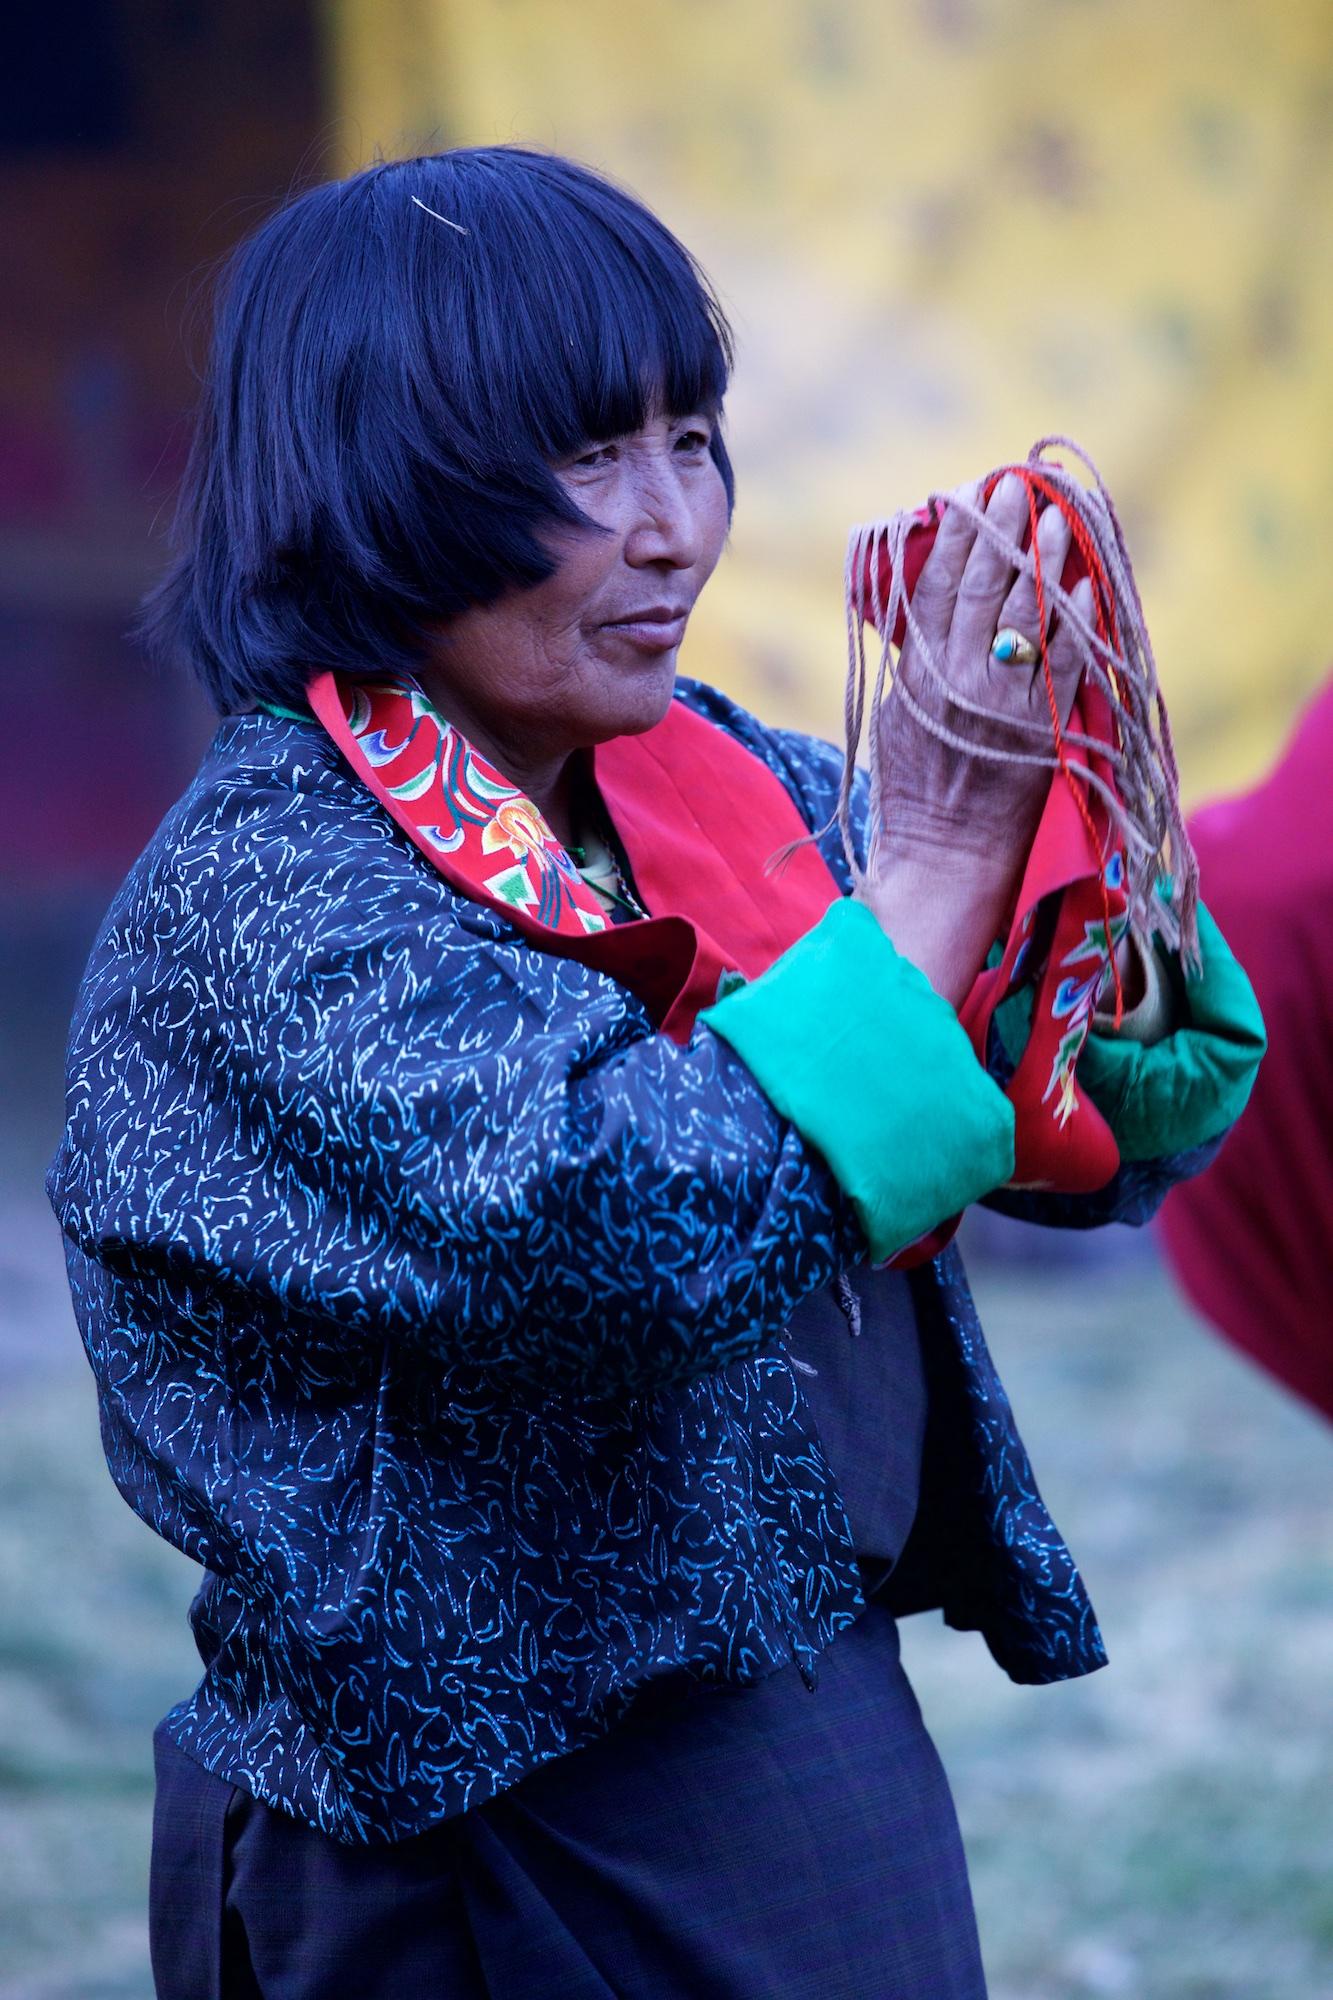 Bhutan-2016- C26O9669.jpg